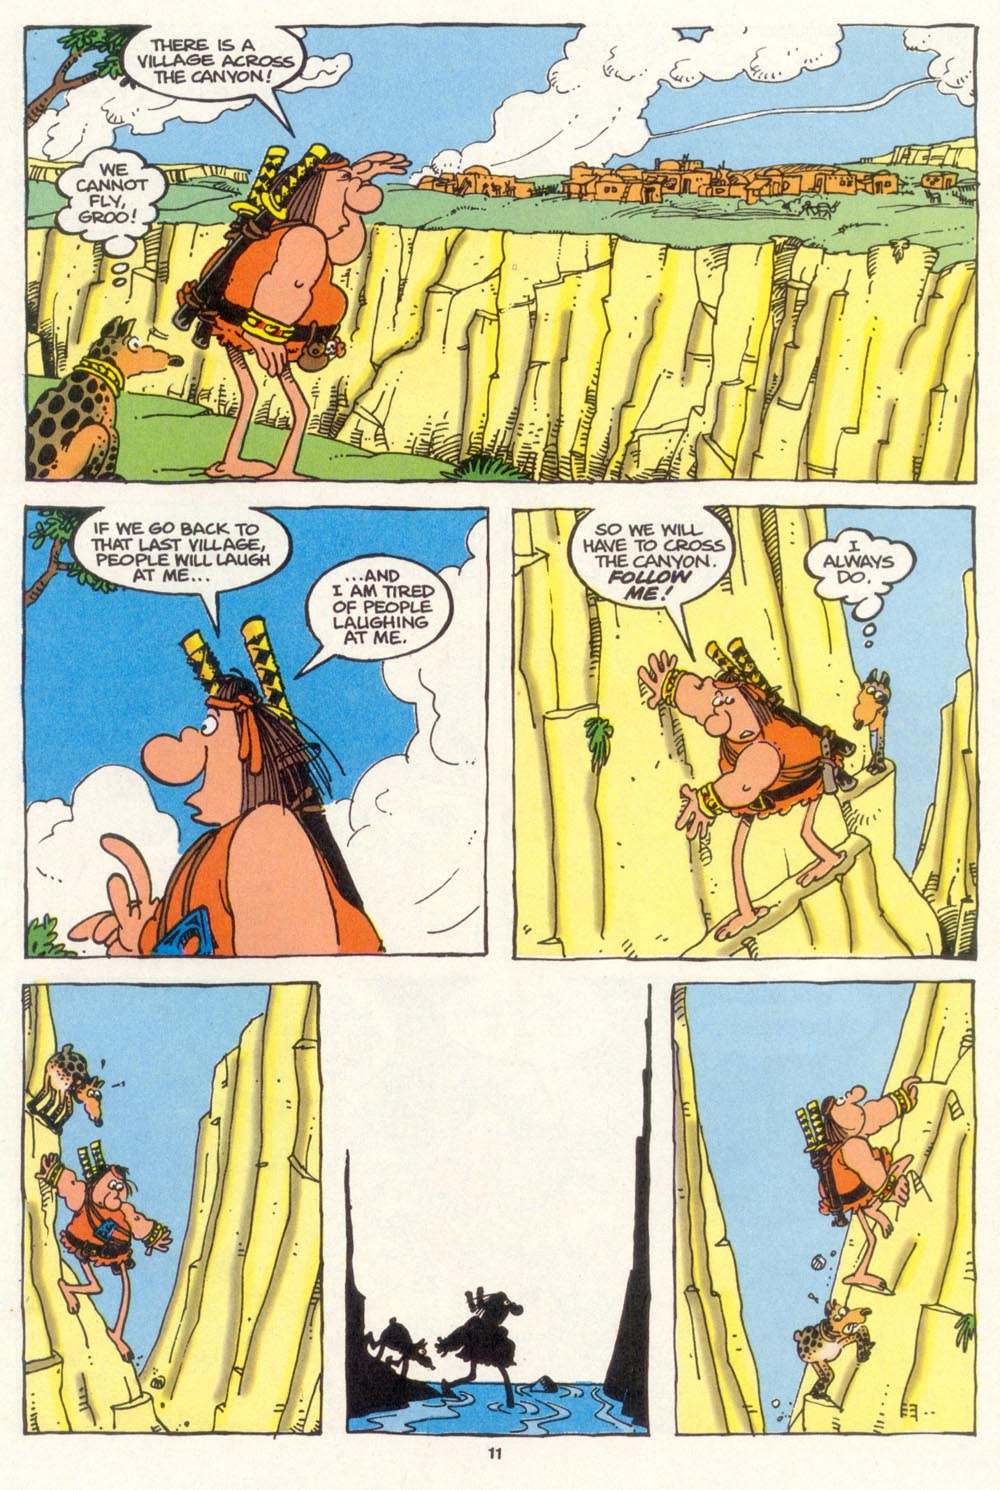 Read online Sergio Aragonés Groo the Wanderer comic -  Issue #102 - 13